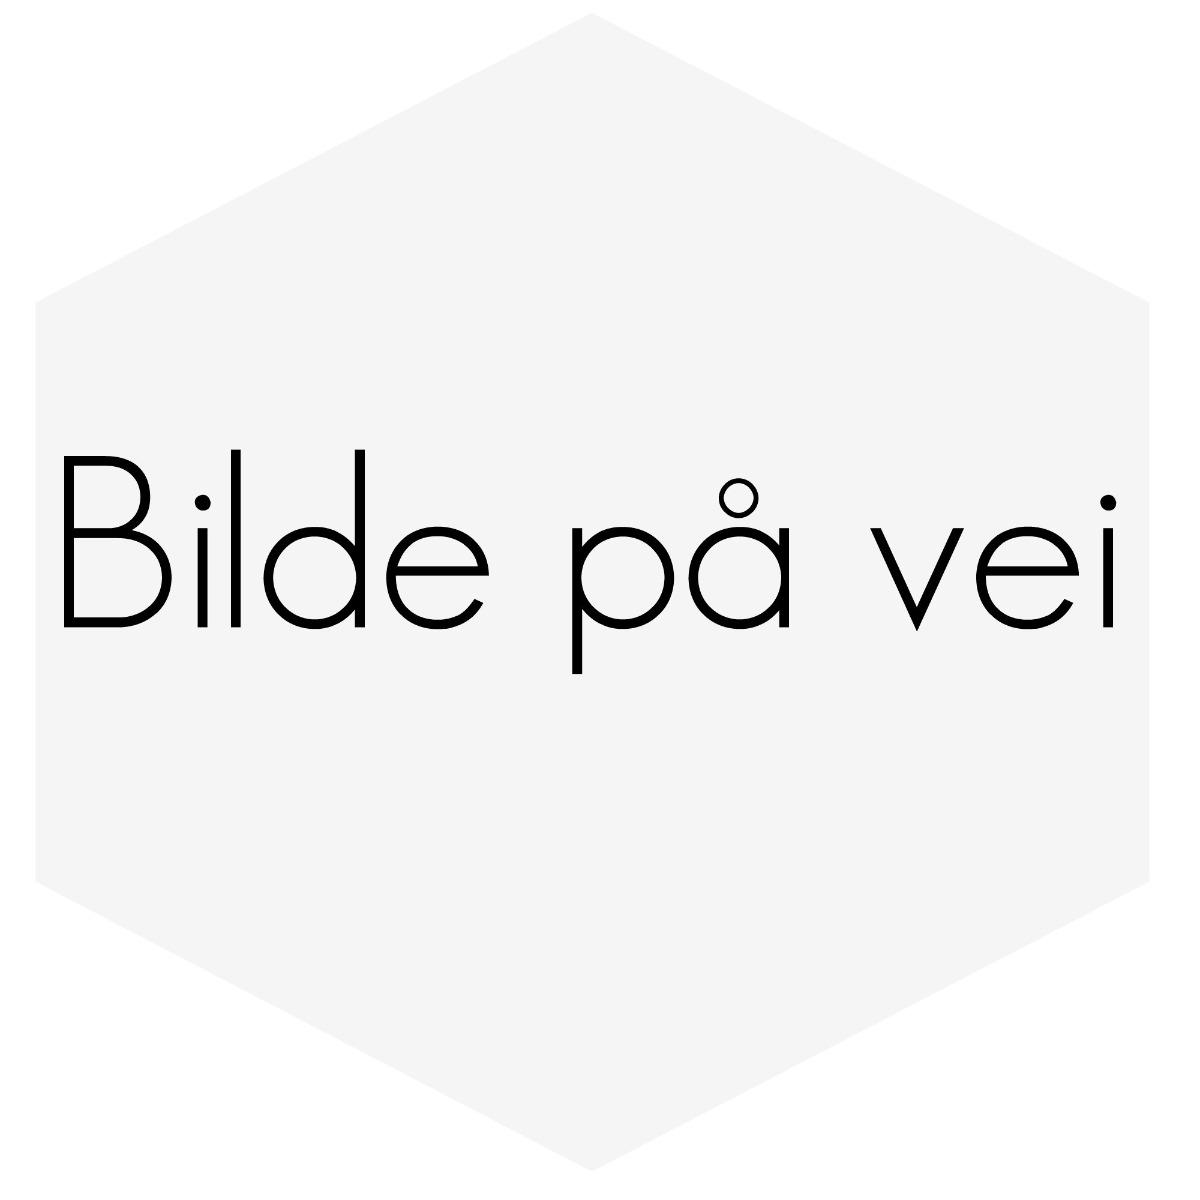 HÅNDBREKK WIRE TIL VOLVO 960,760,S/V90 SE INFO